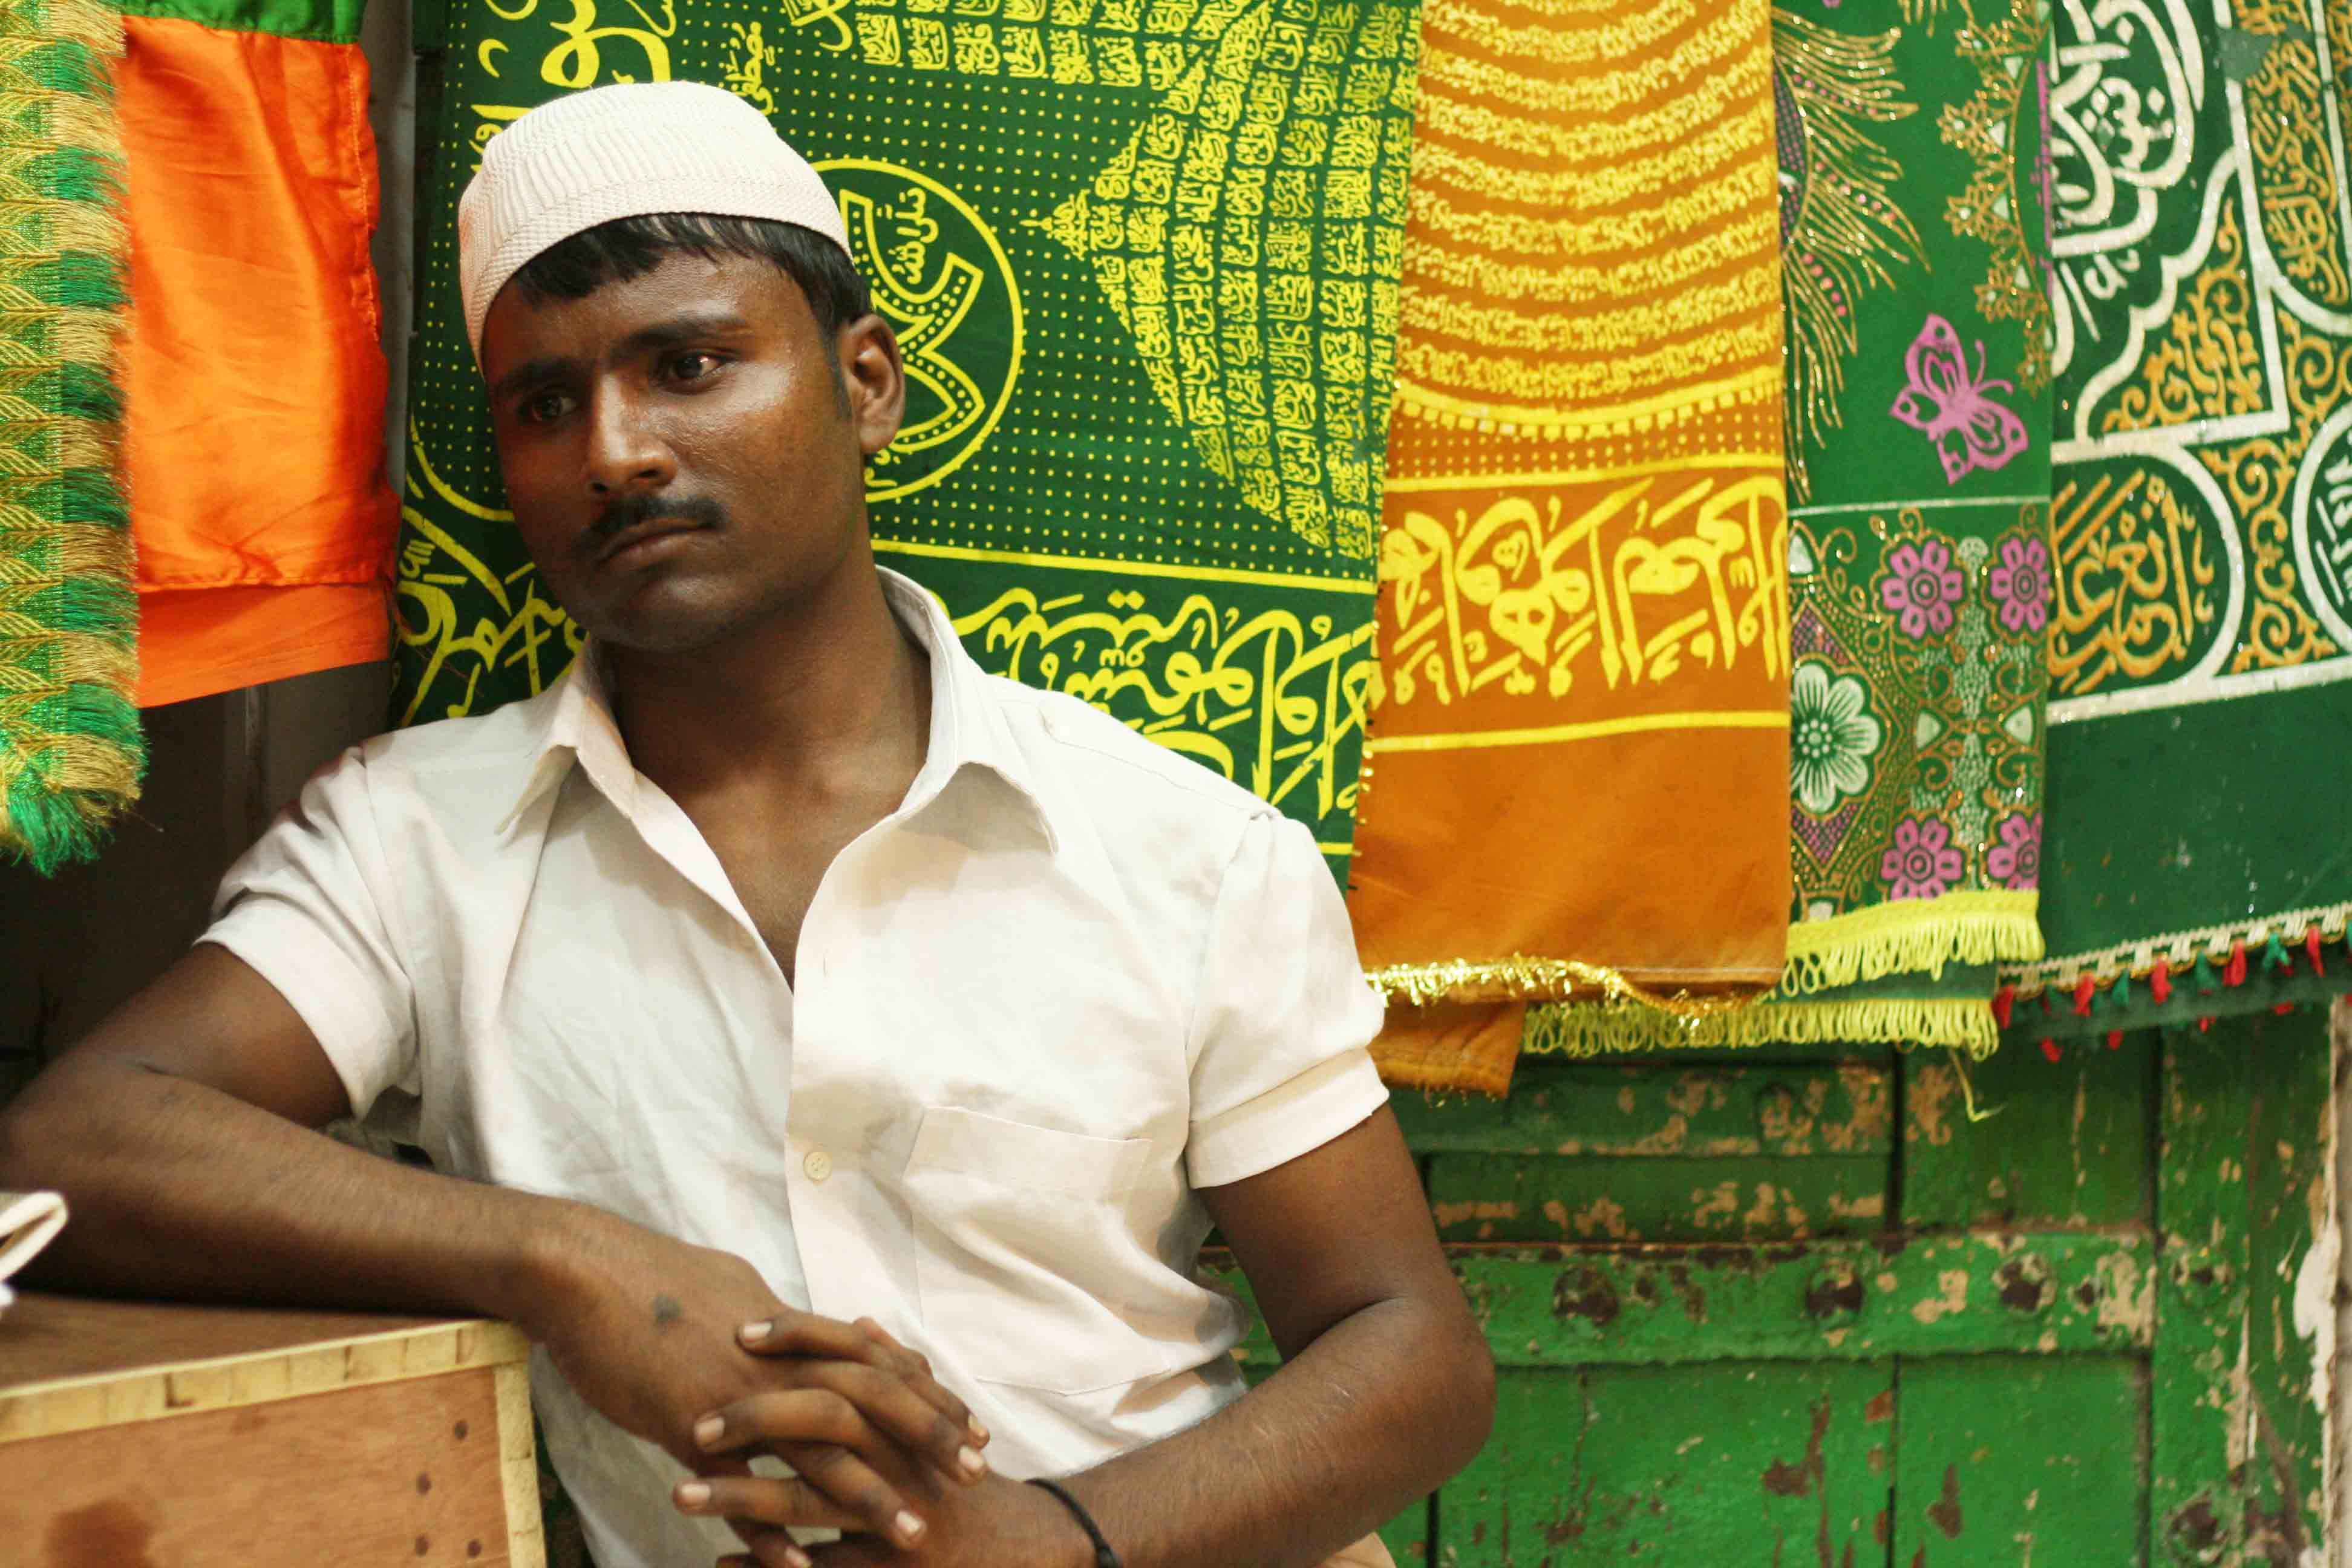 Delhi's Proust Questionnaire – Muhammad Dawood, Hazrat Nizamuddin Auliya's Dargah